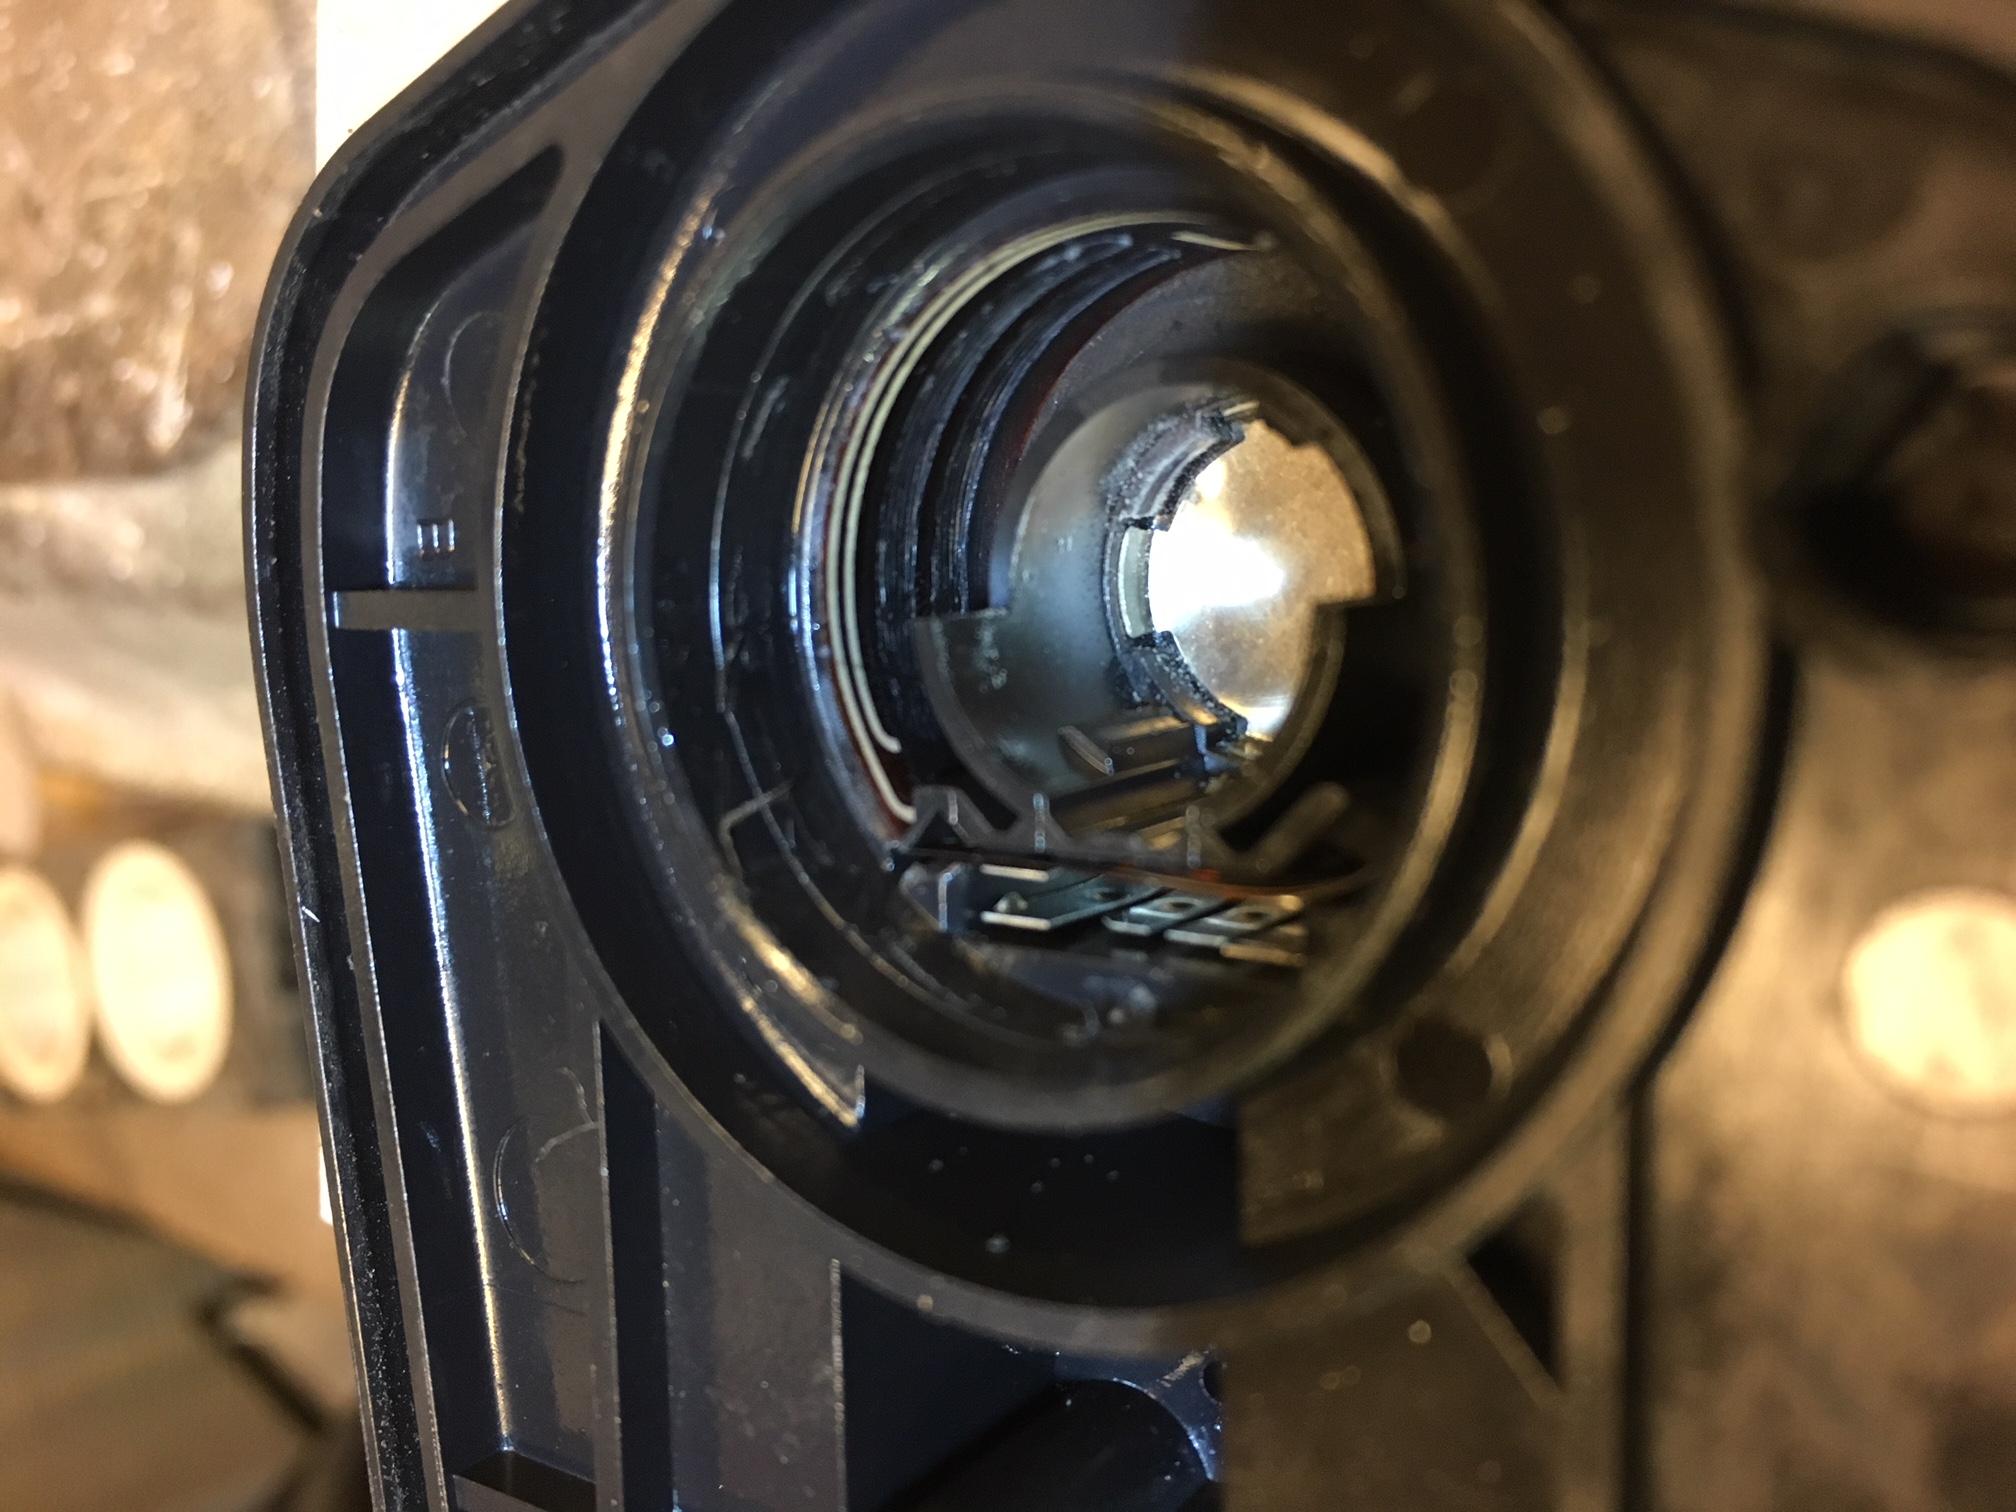 Click image for larger version  Name:Dirt_resistor.JPG Views:56 Size:792.6 KB ID:187323